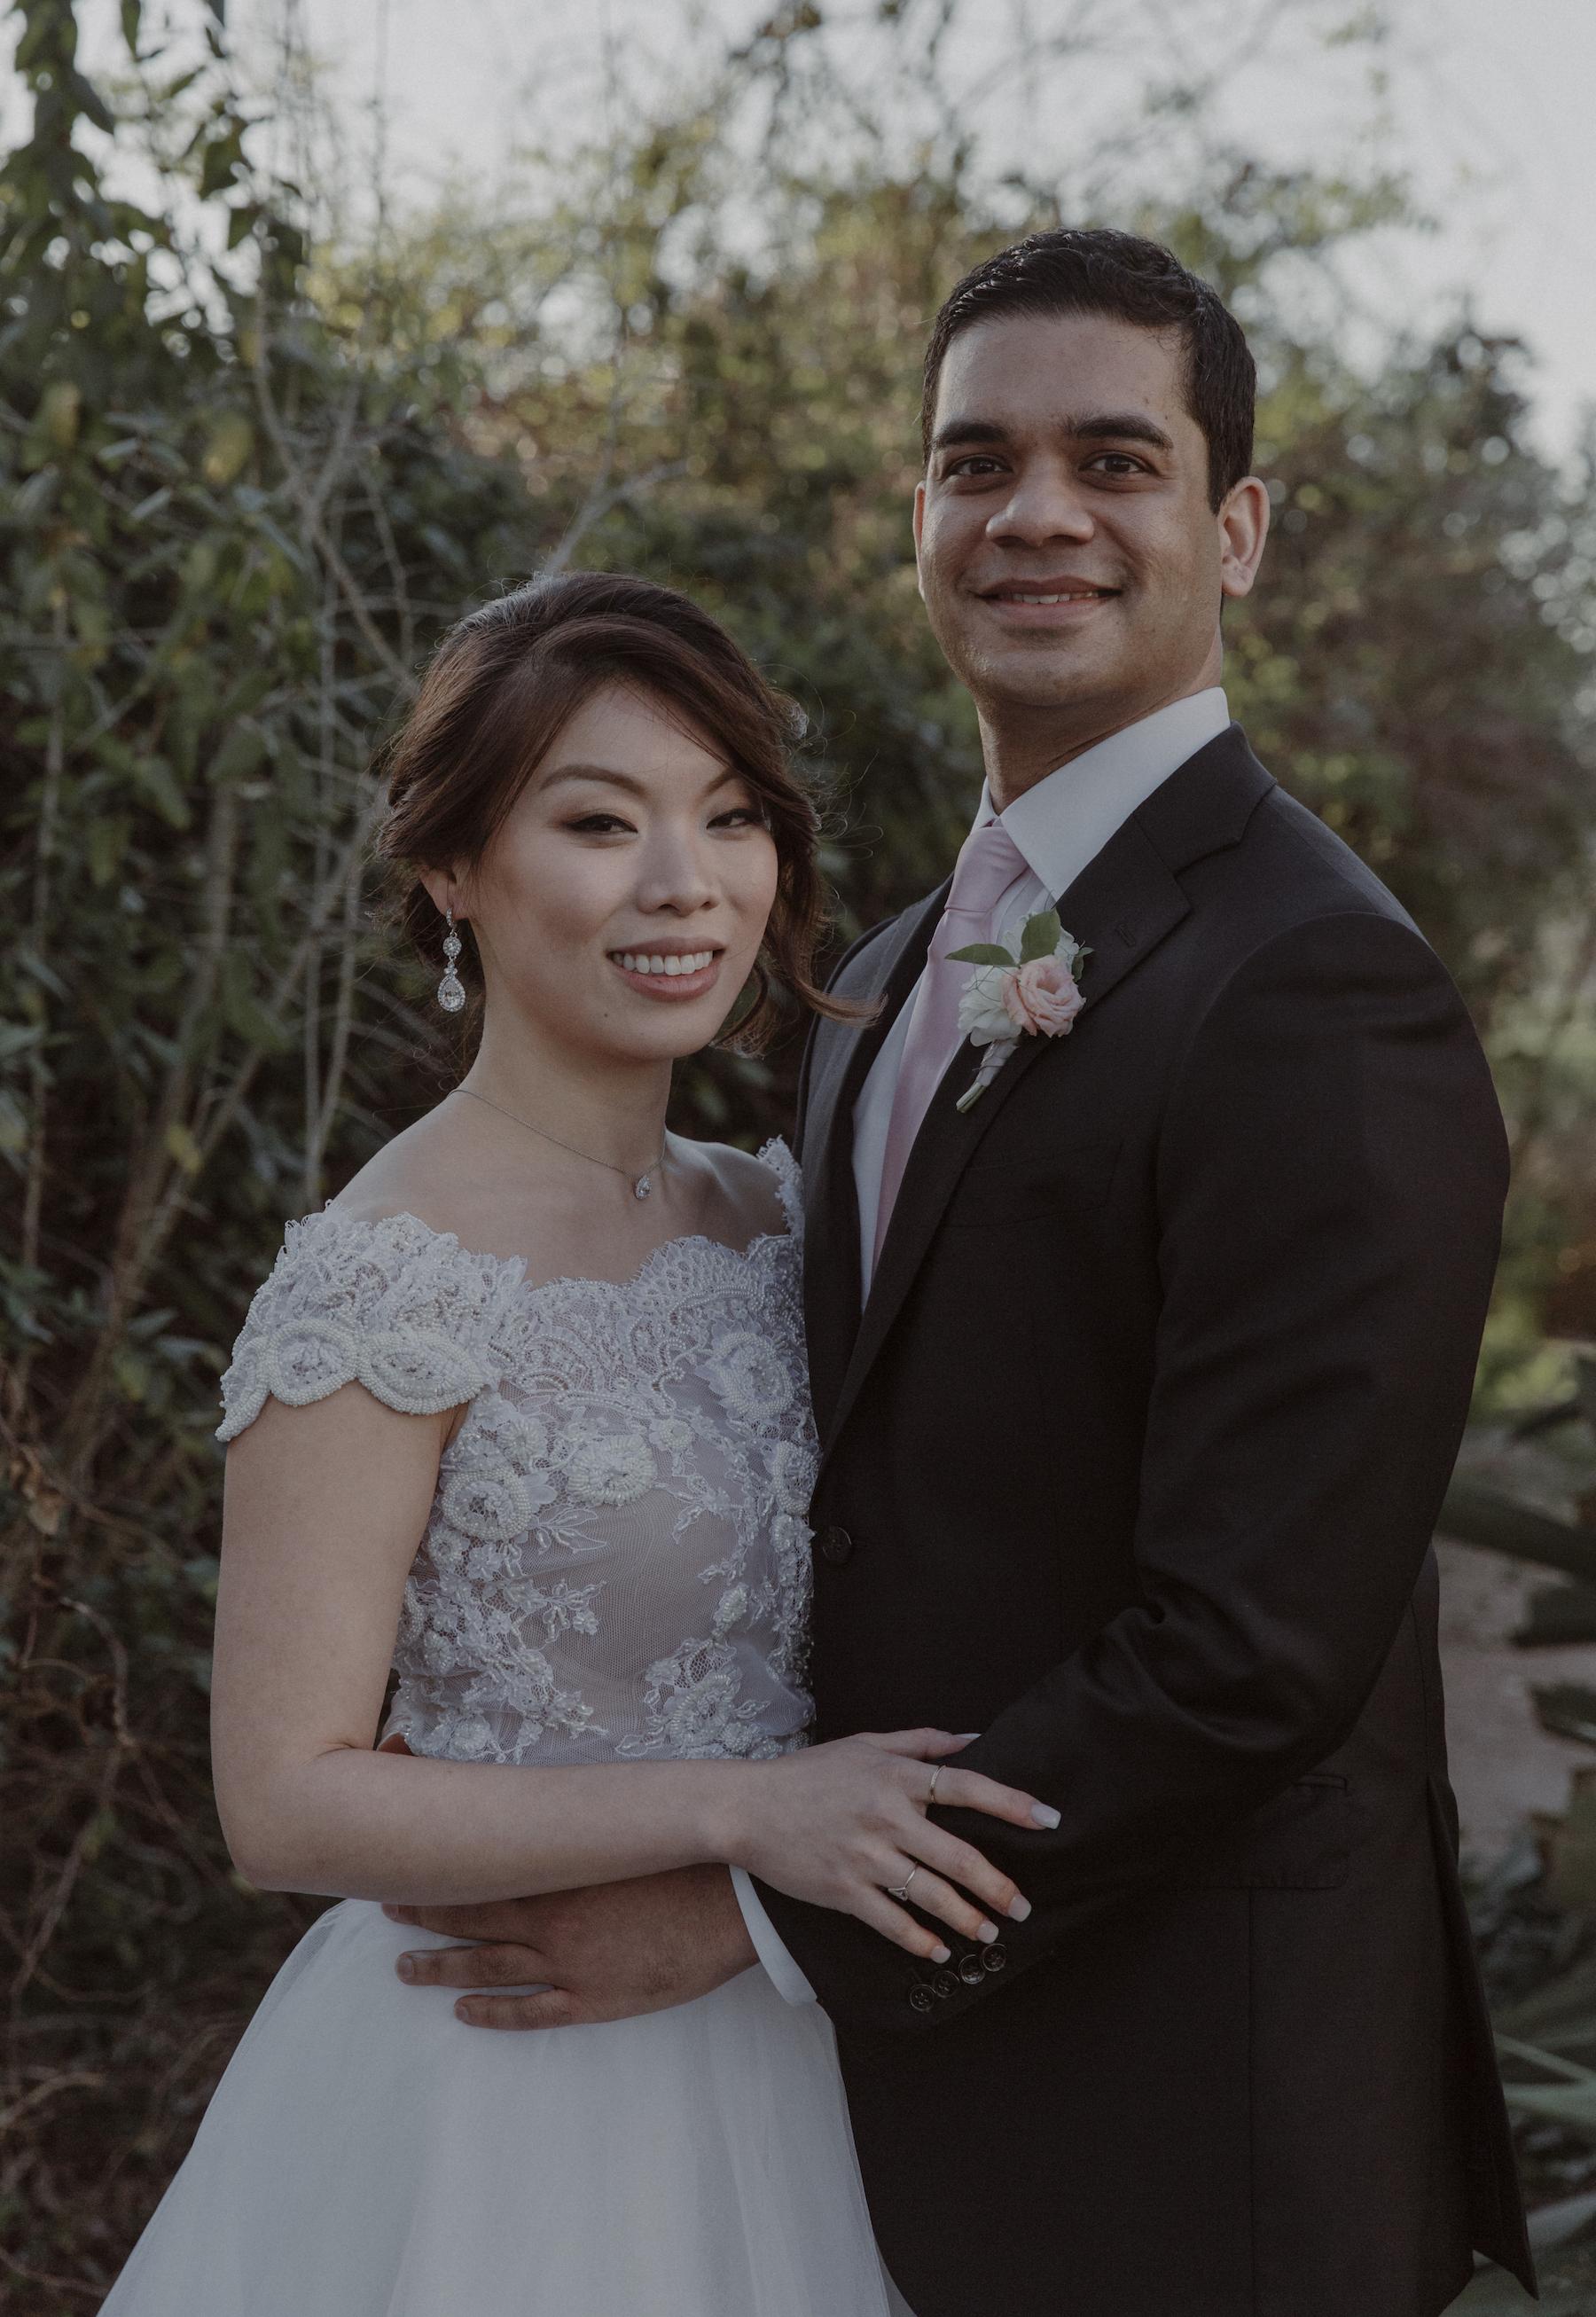 barr-mansion-wedding-austin-texas8881.JPG